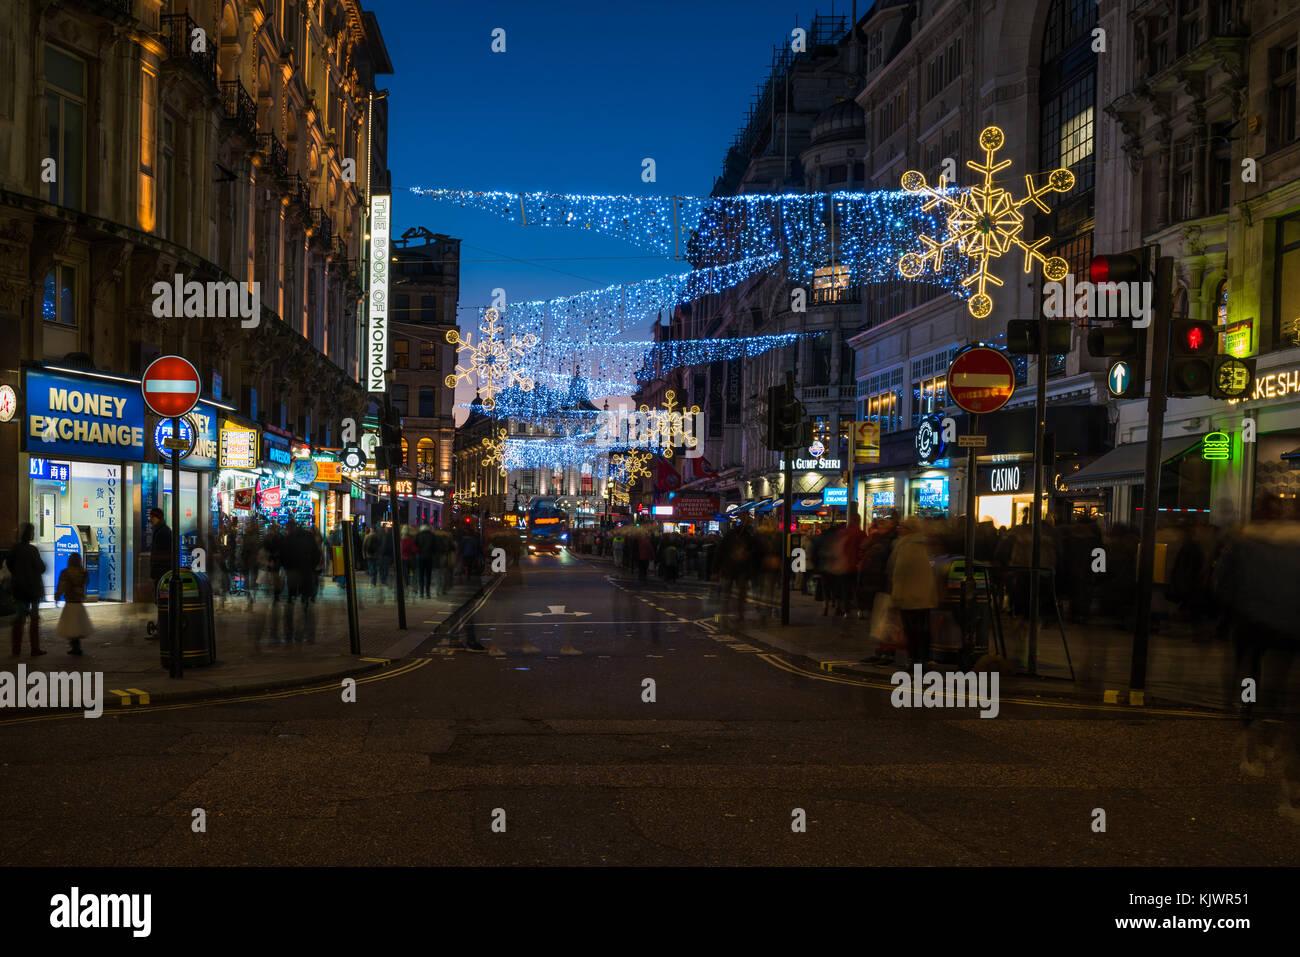 LONDON - NOVEMBER 25, 2017: Christmas lights on Coventry Street, London, UK. The Christmas lights attract thousands - Stock Image